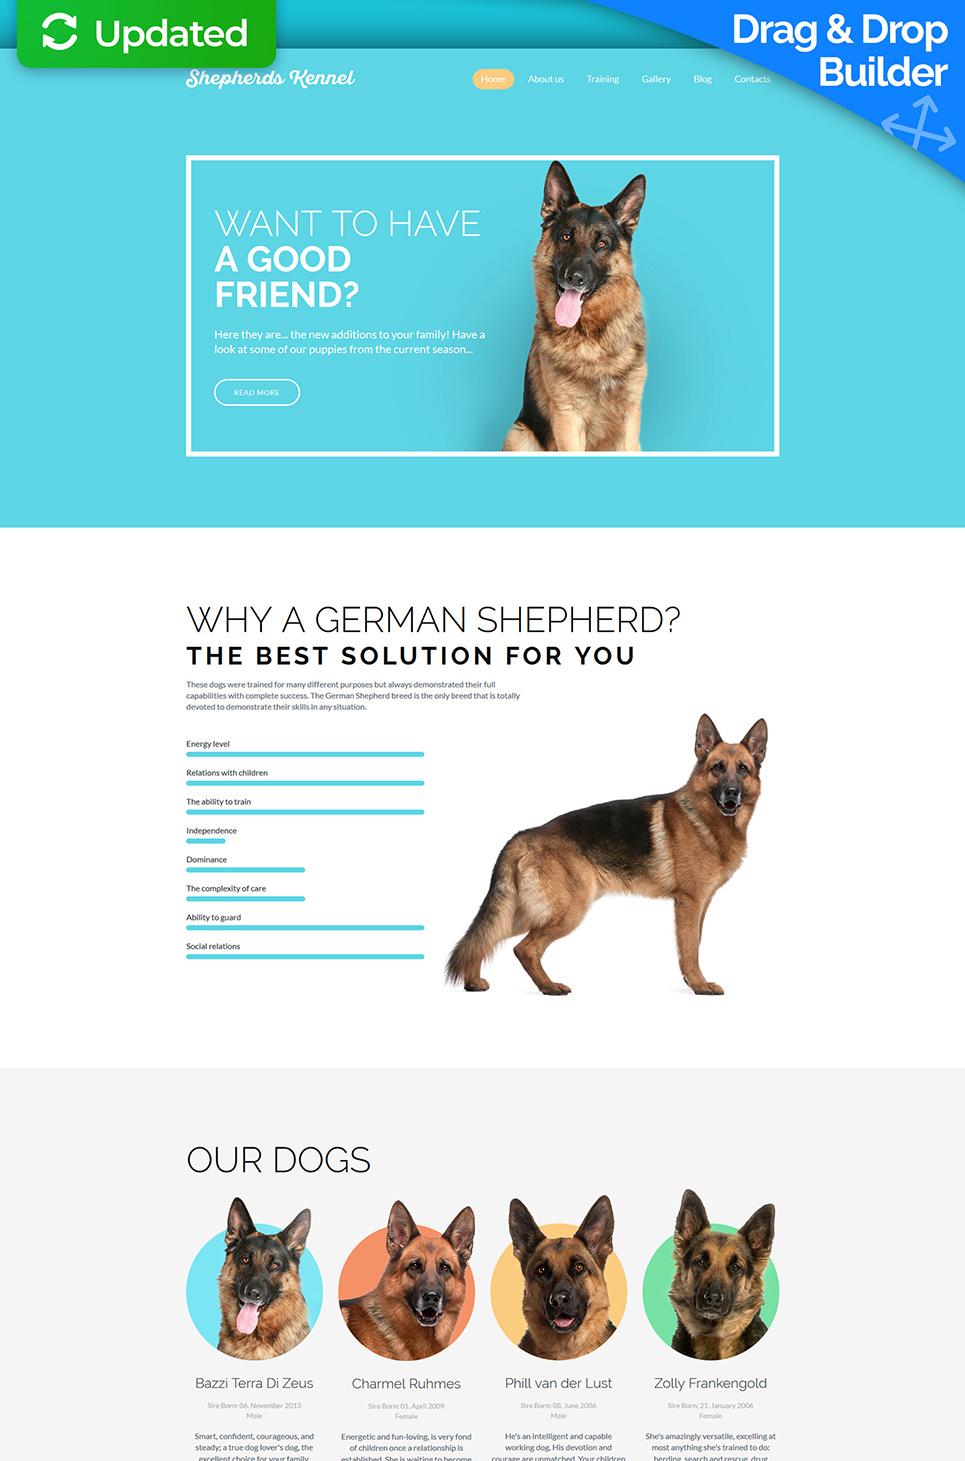 Shepherds Kennel Responsive Website Template - image